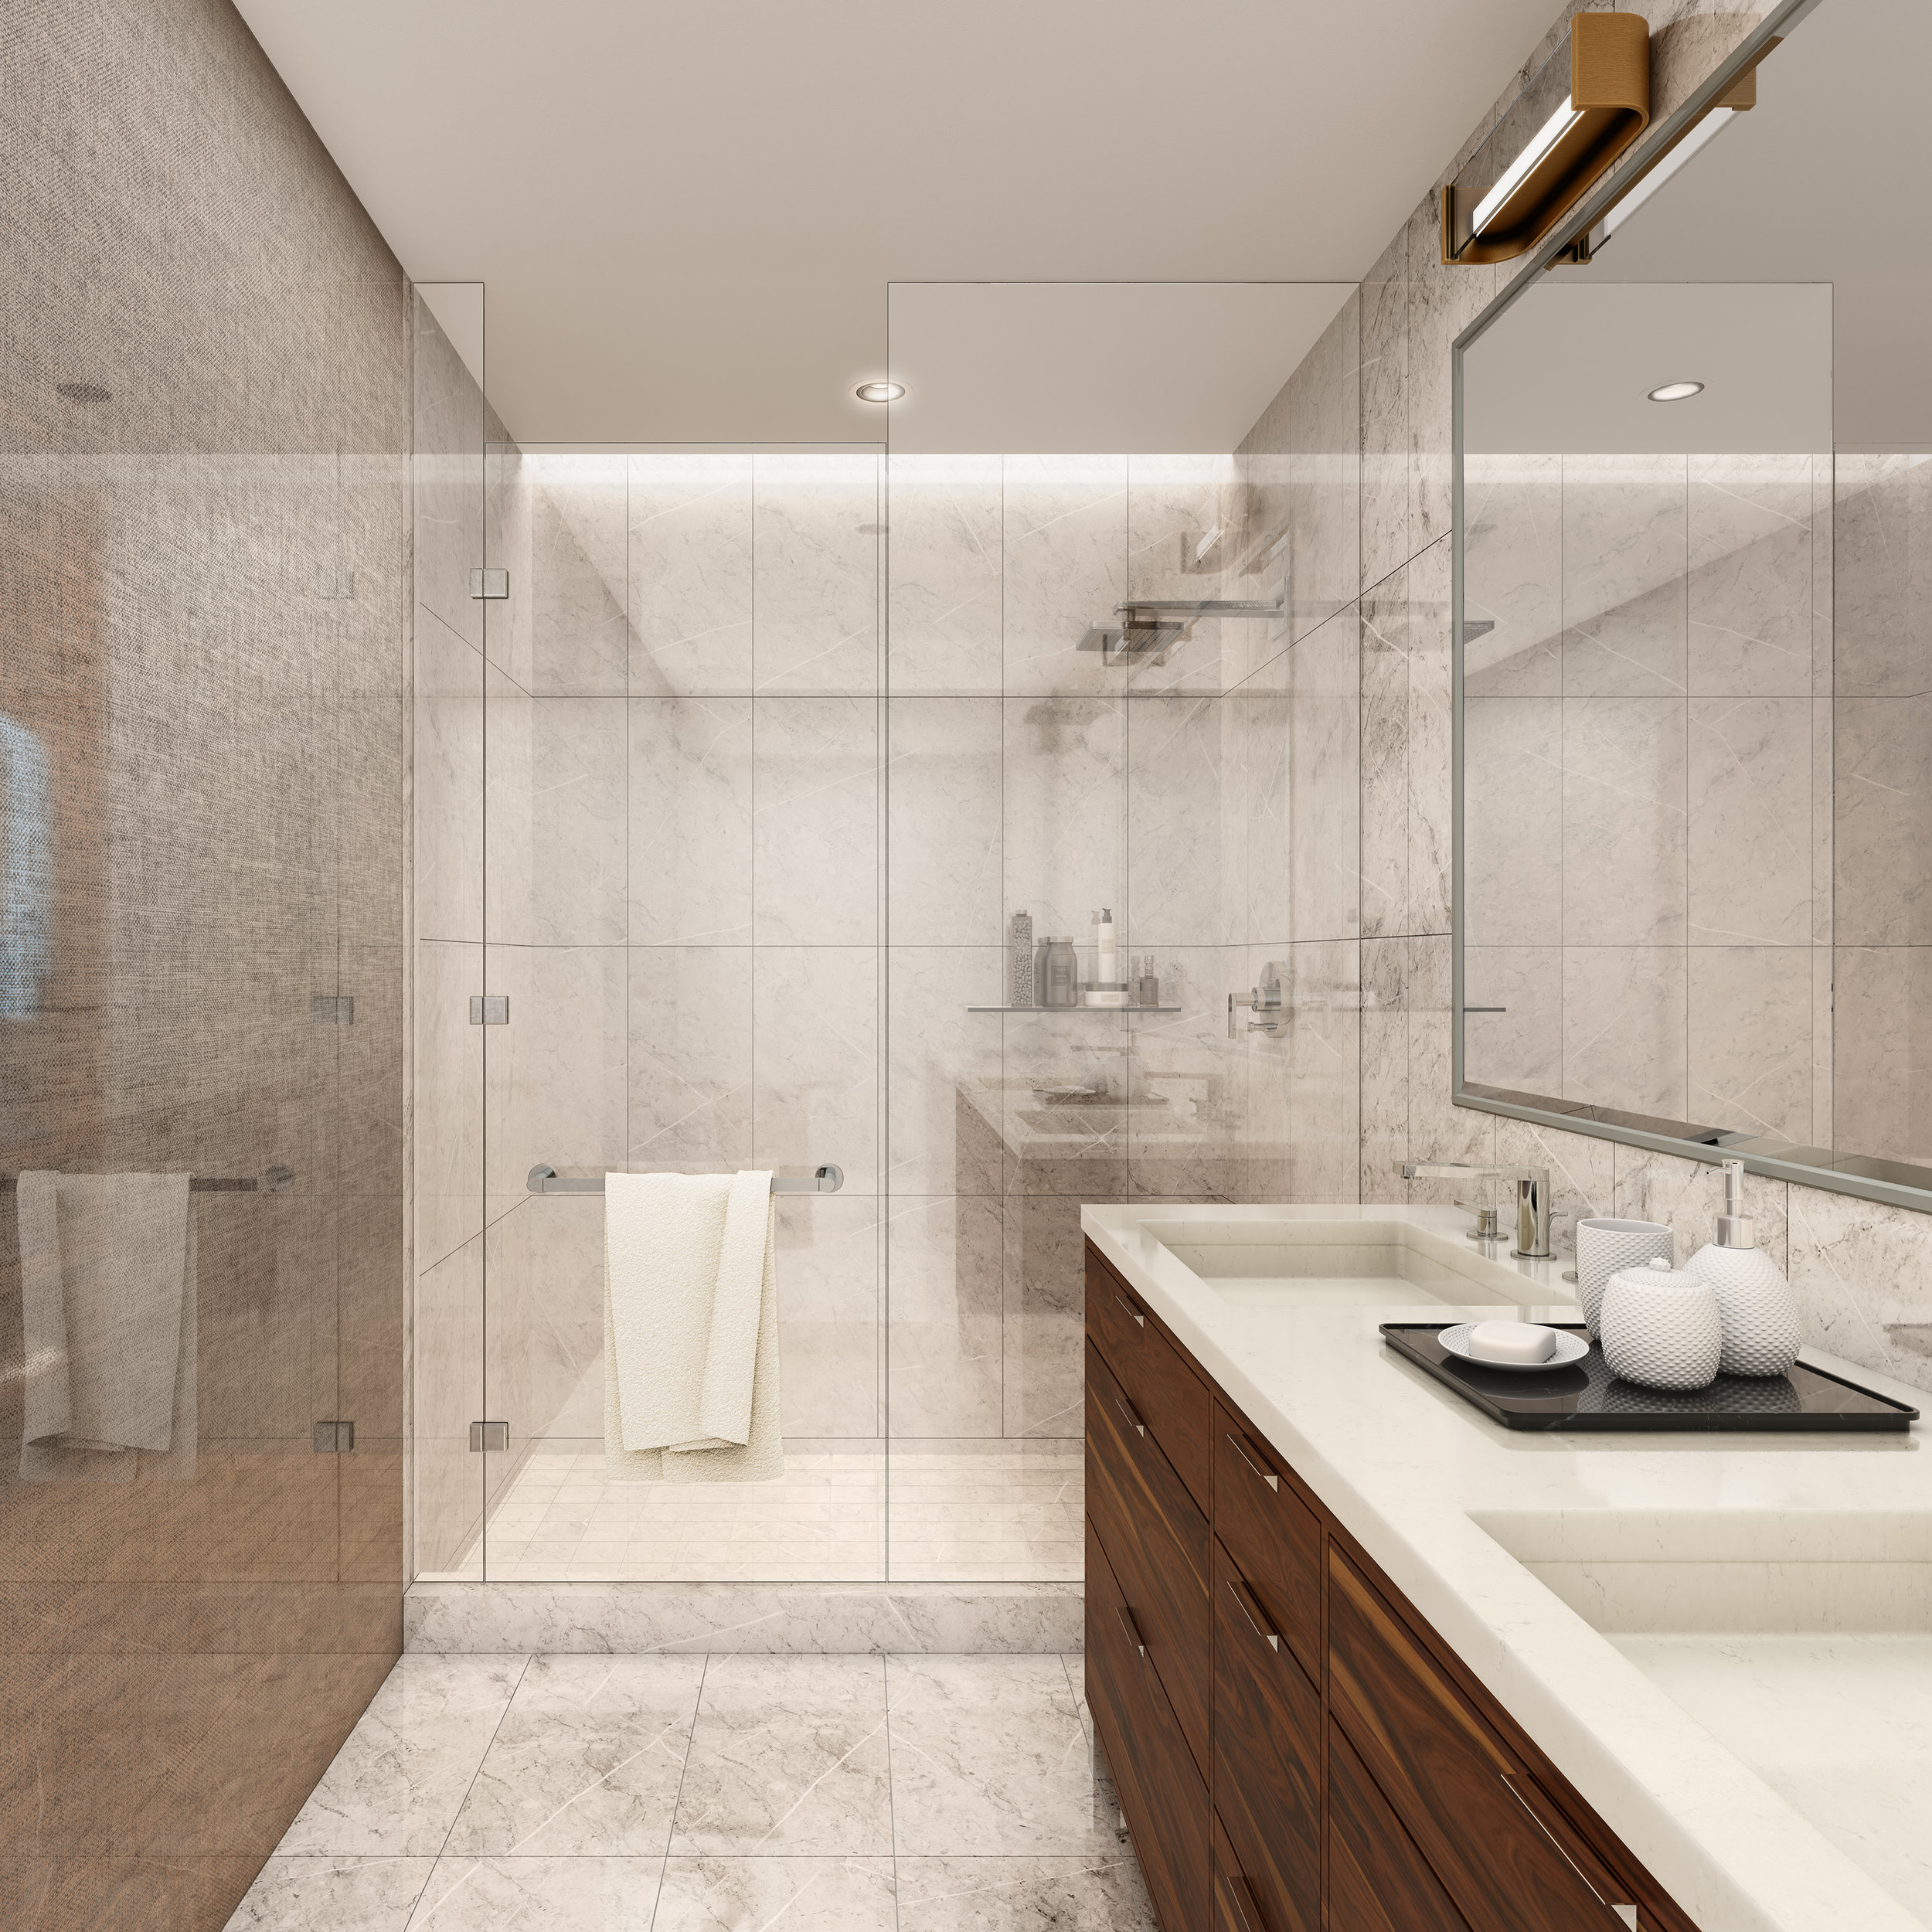 THEONE_bathroom_FINAL-1.jpg